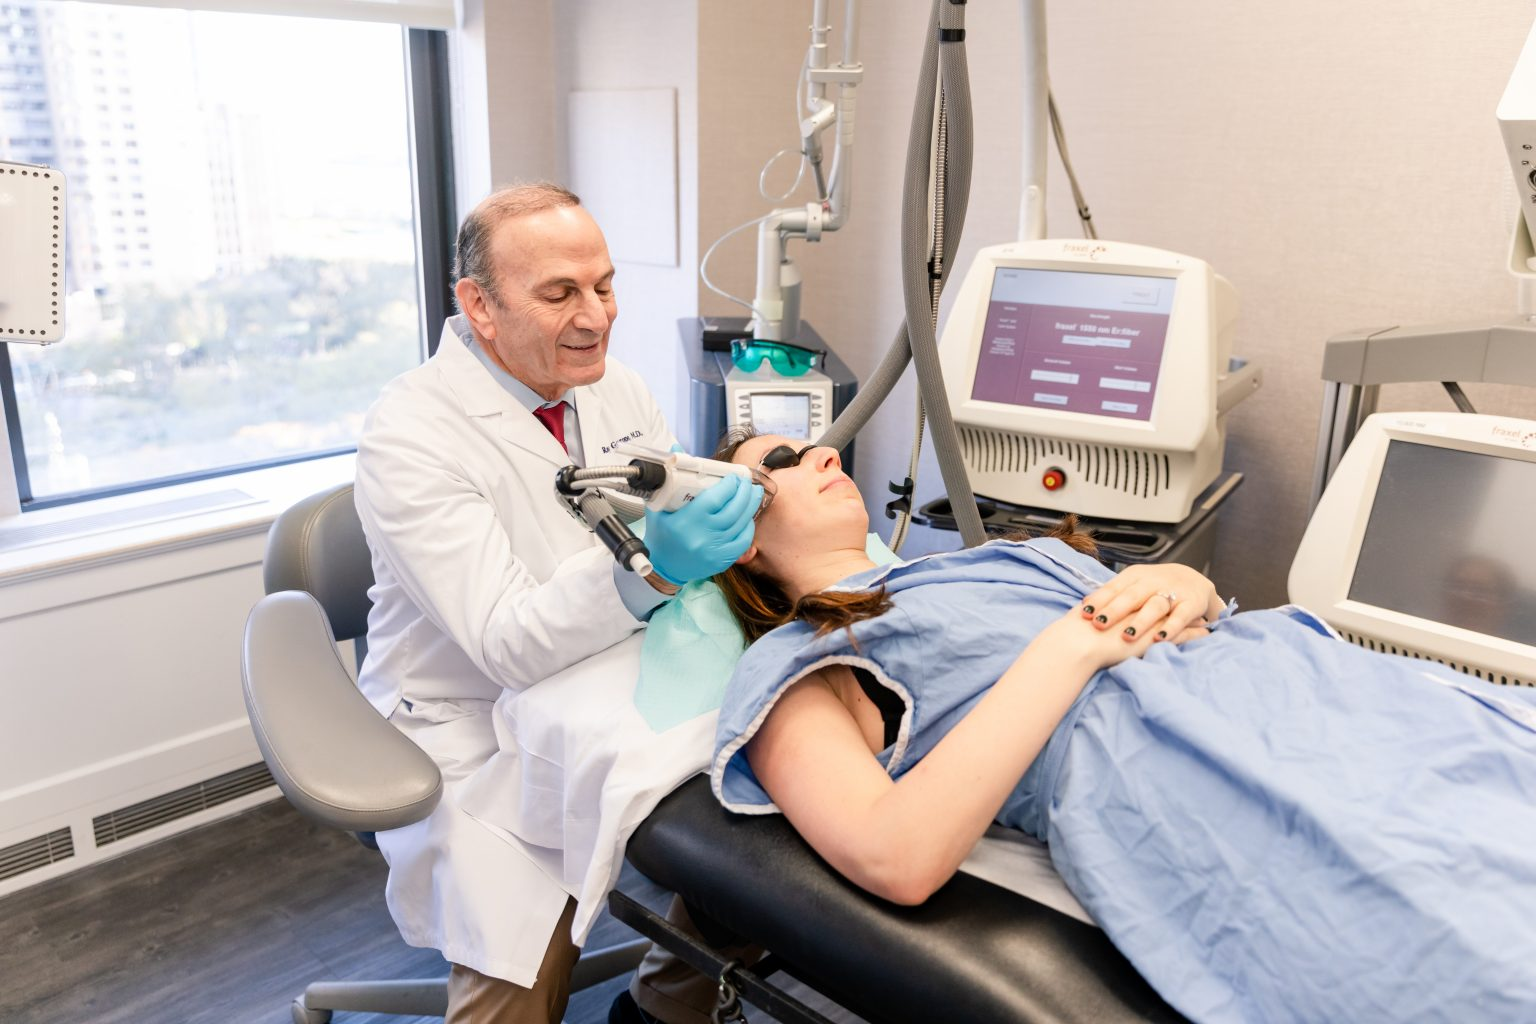 fractional laser treatments for neck rejuvenation in Manhattan, NY